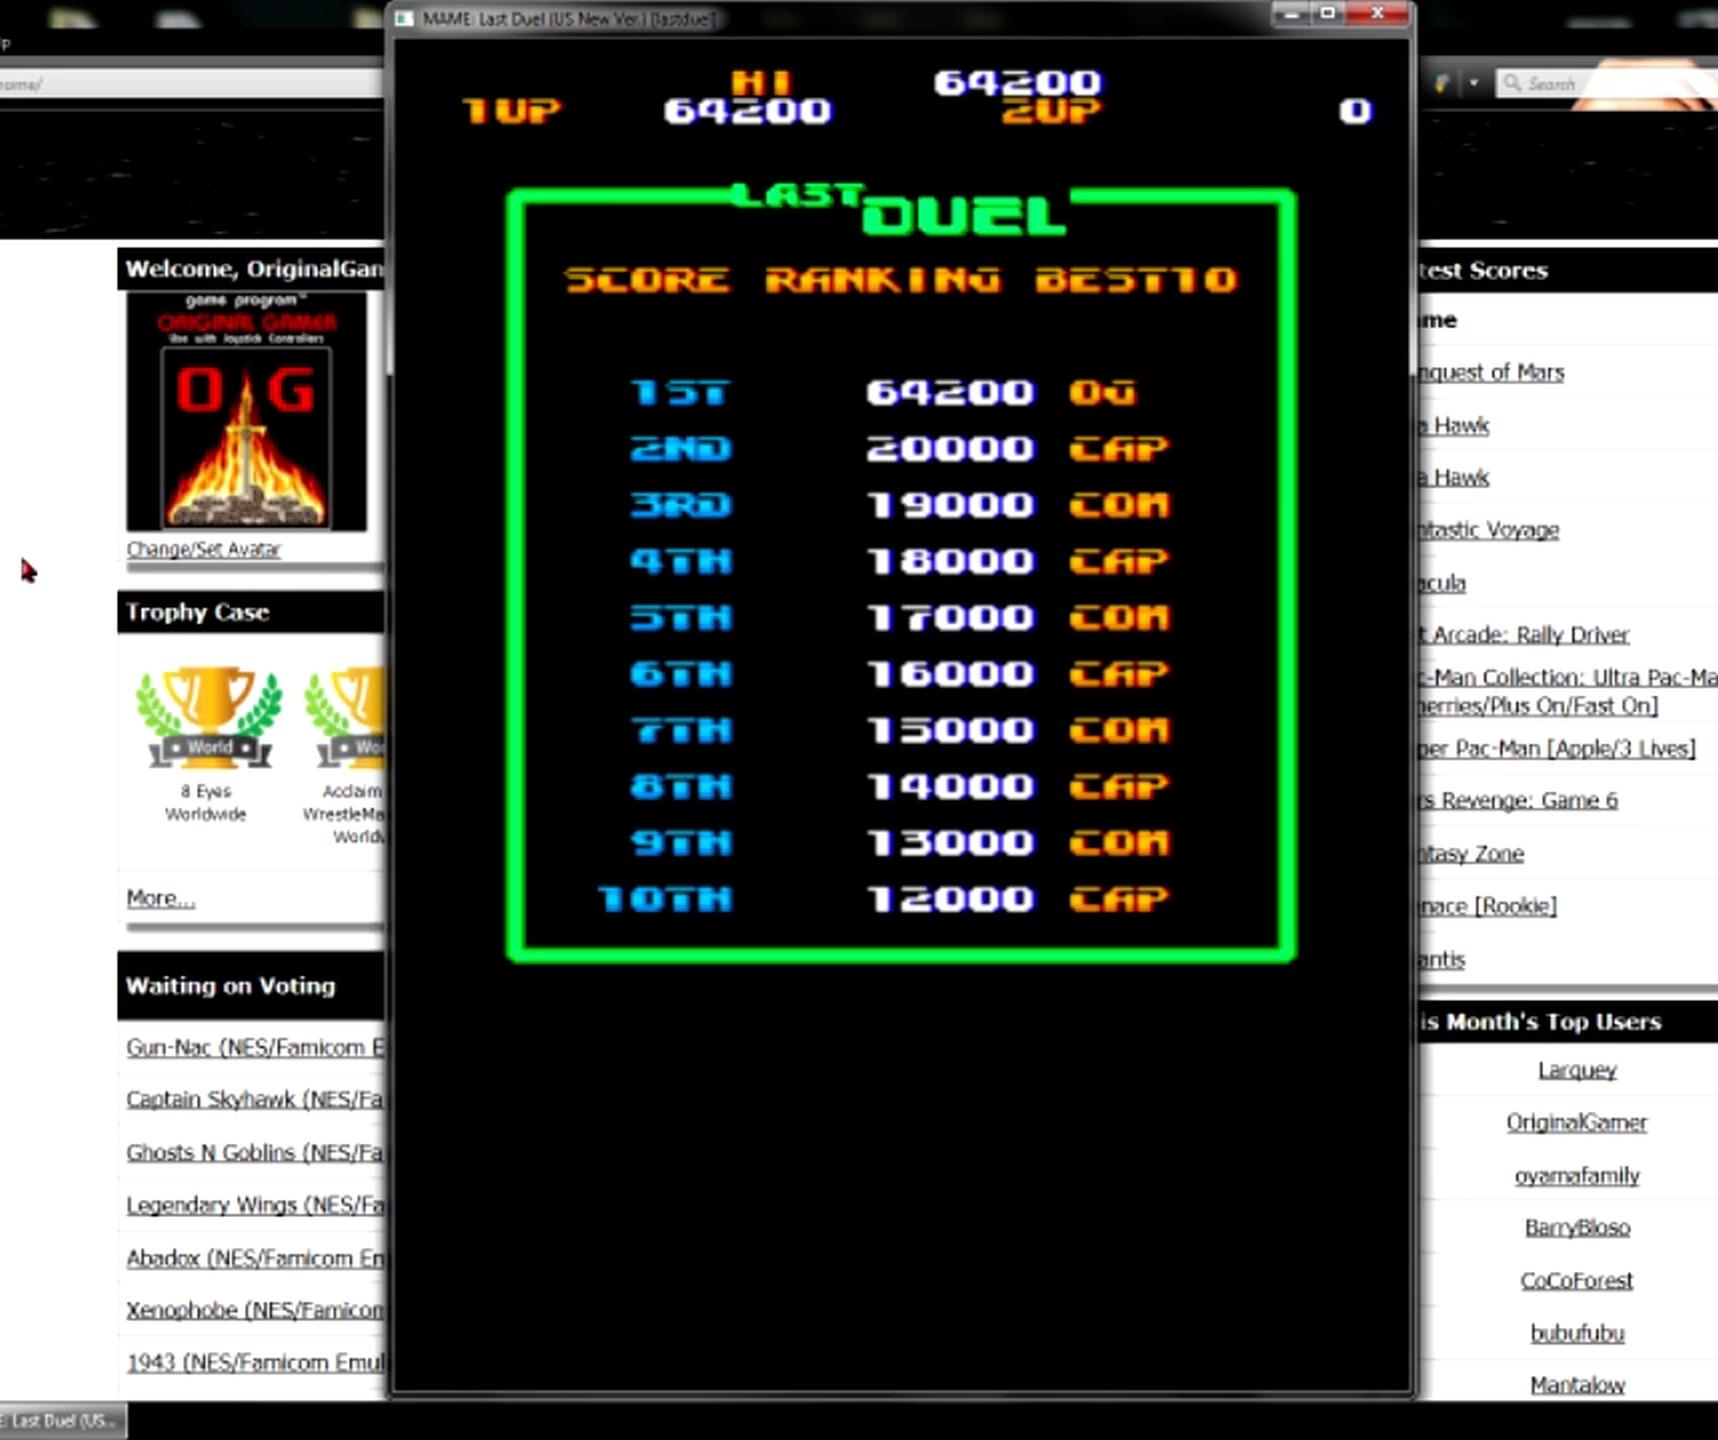 OriginalGamer: Last Duel [lastduel] (Arcade Emulated / M.A.M.E.) 64,200 points on 2015-05-11 13:26:25